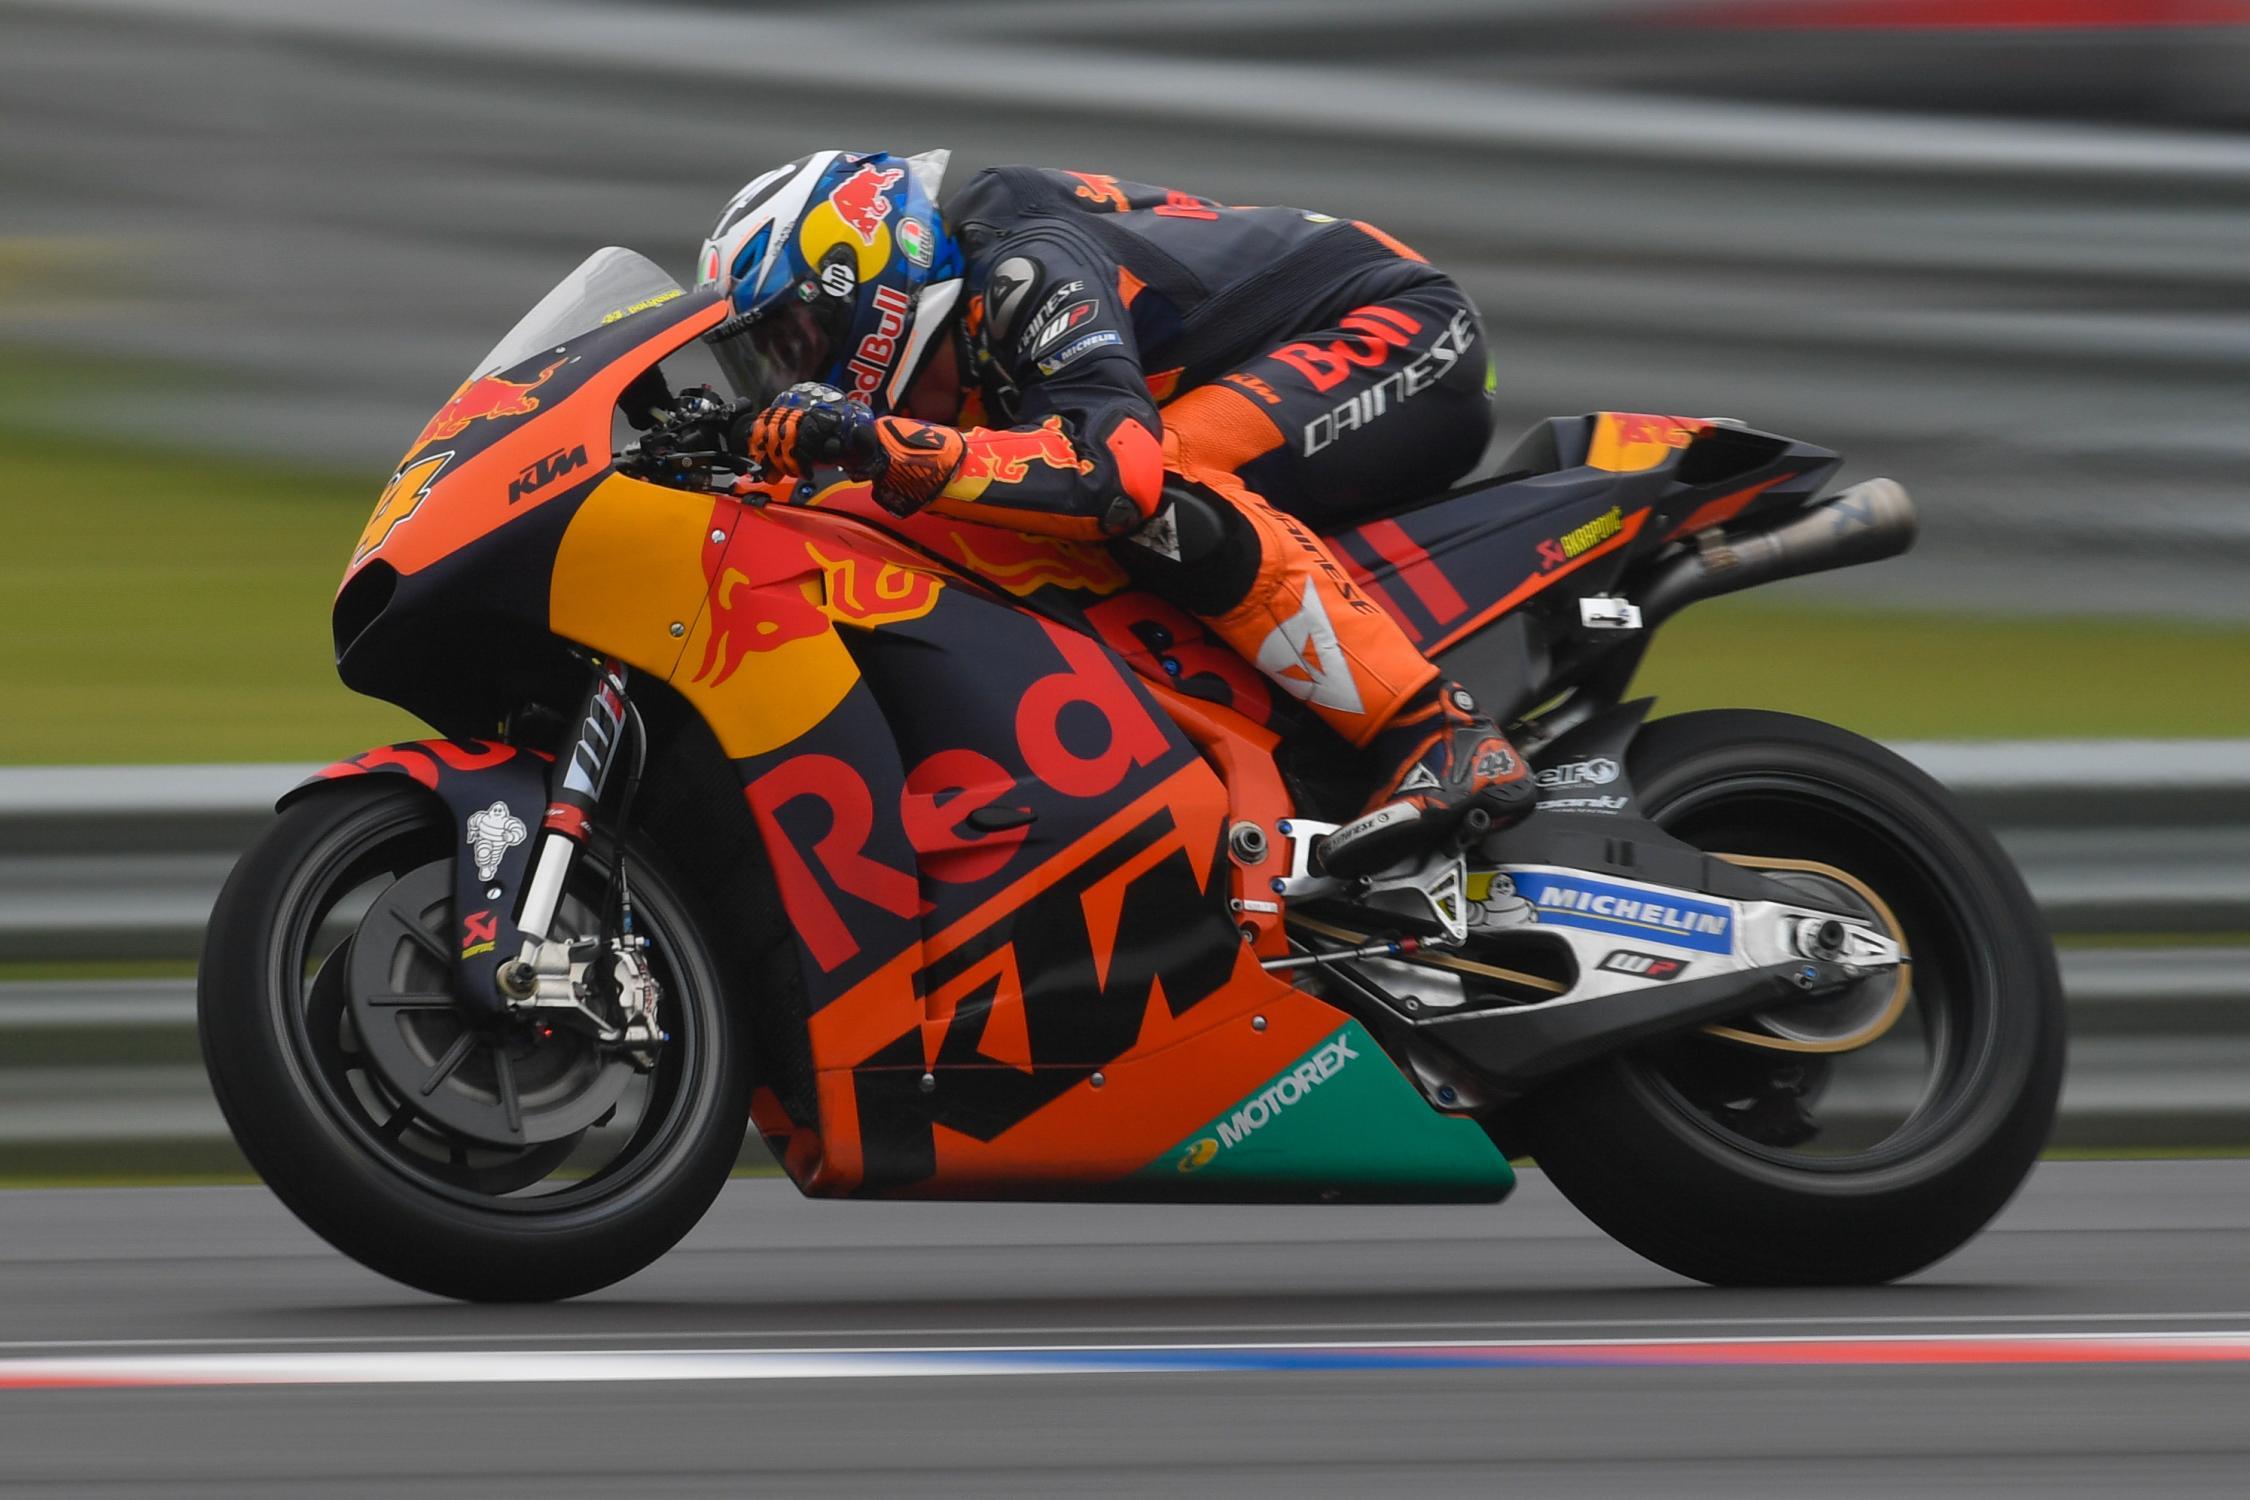 [MotoGP] Argentine 44-pol-espargaro-esplg5_6863.gallery_full_top_fullscreen